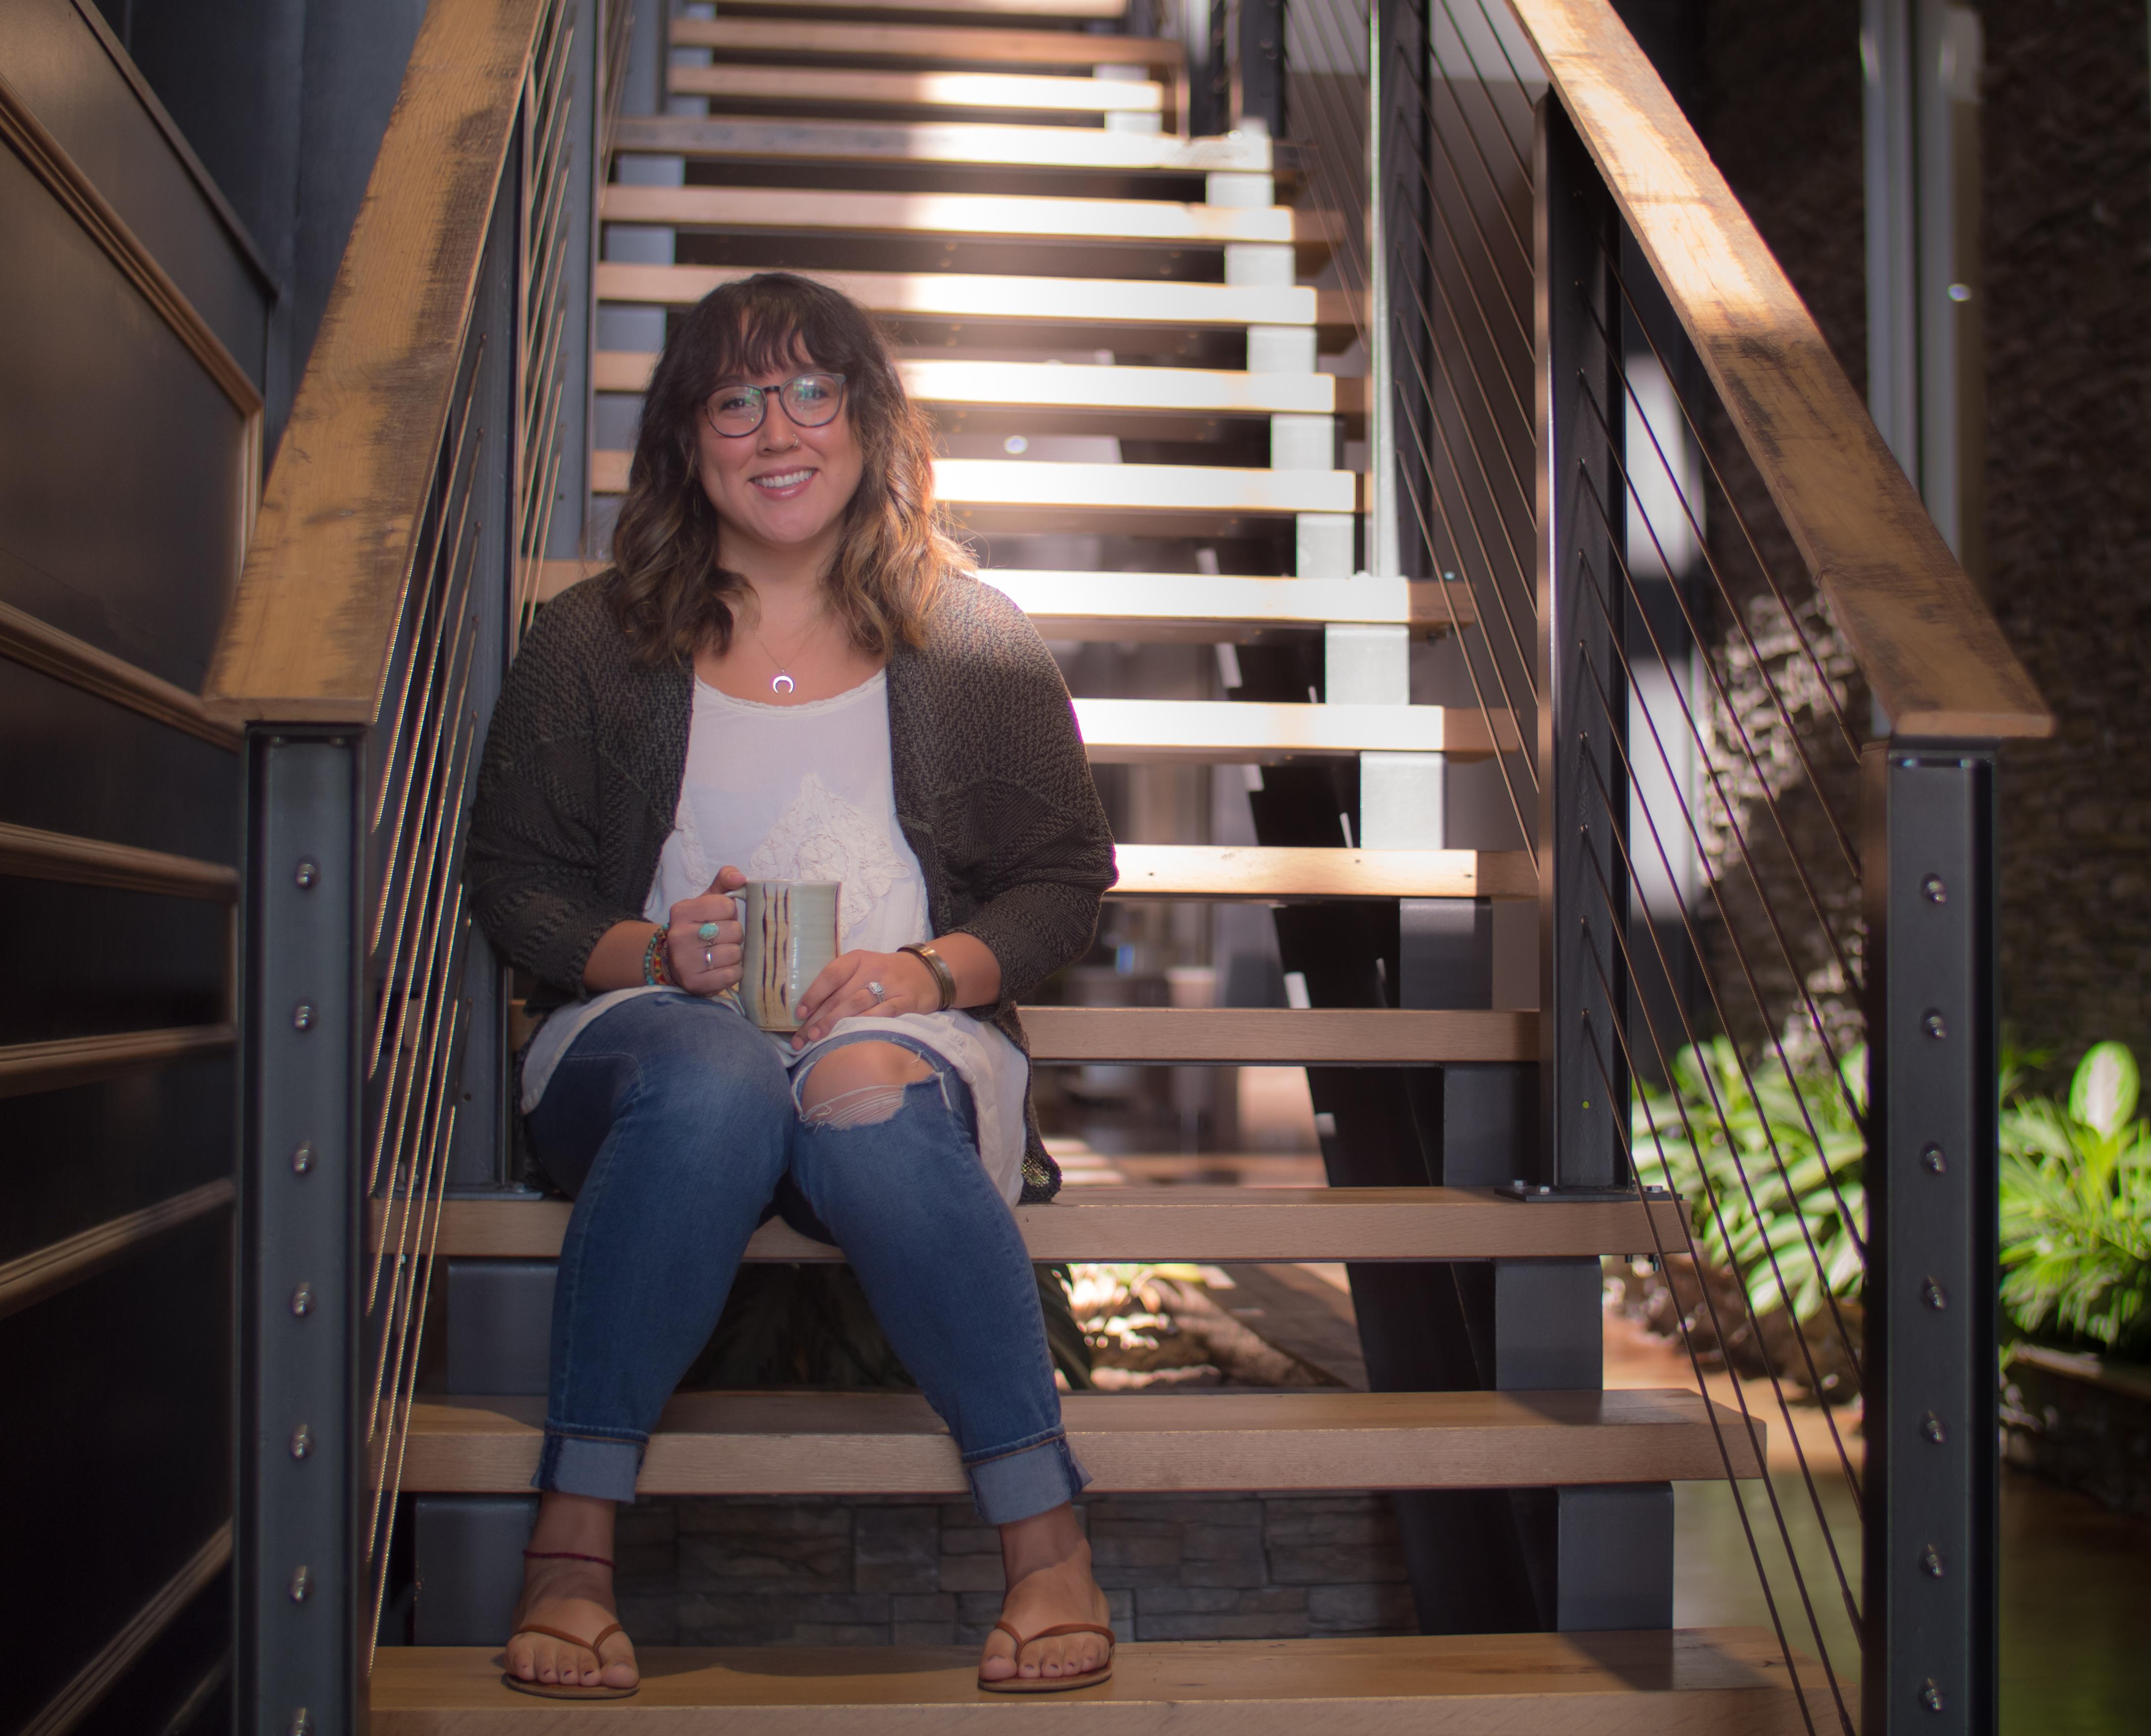 Employee Stories - Heather